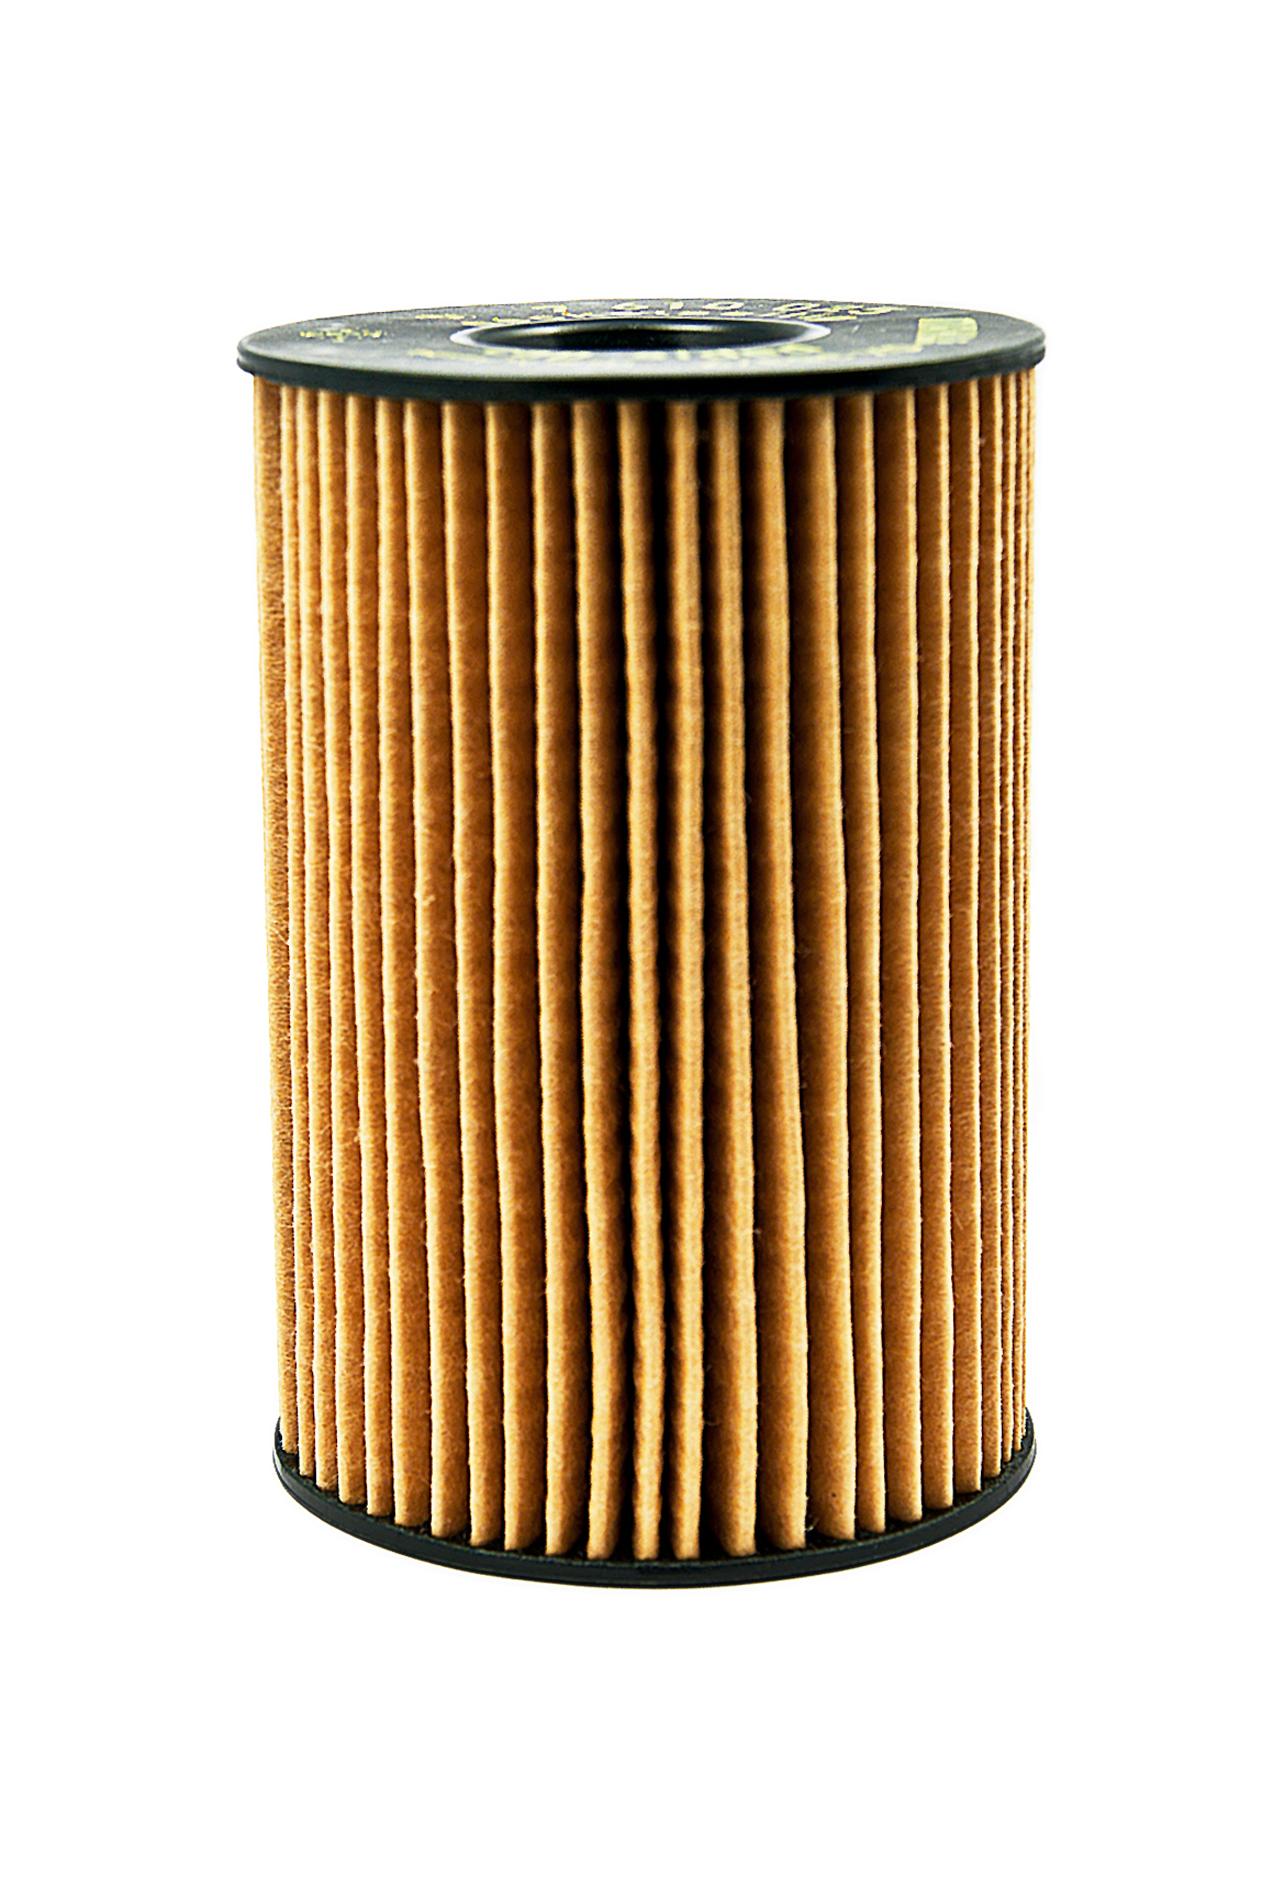 Bmw Genuine Oil Filter Element E36 Gt E85 3 5 7 Series X3 X5 Z3 Z4 11427512300 Ebay